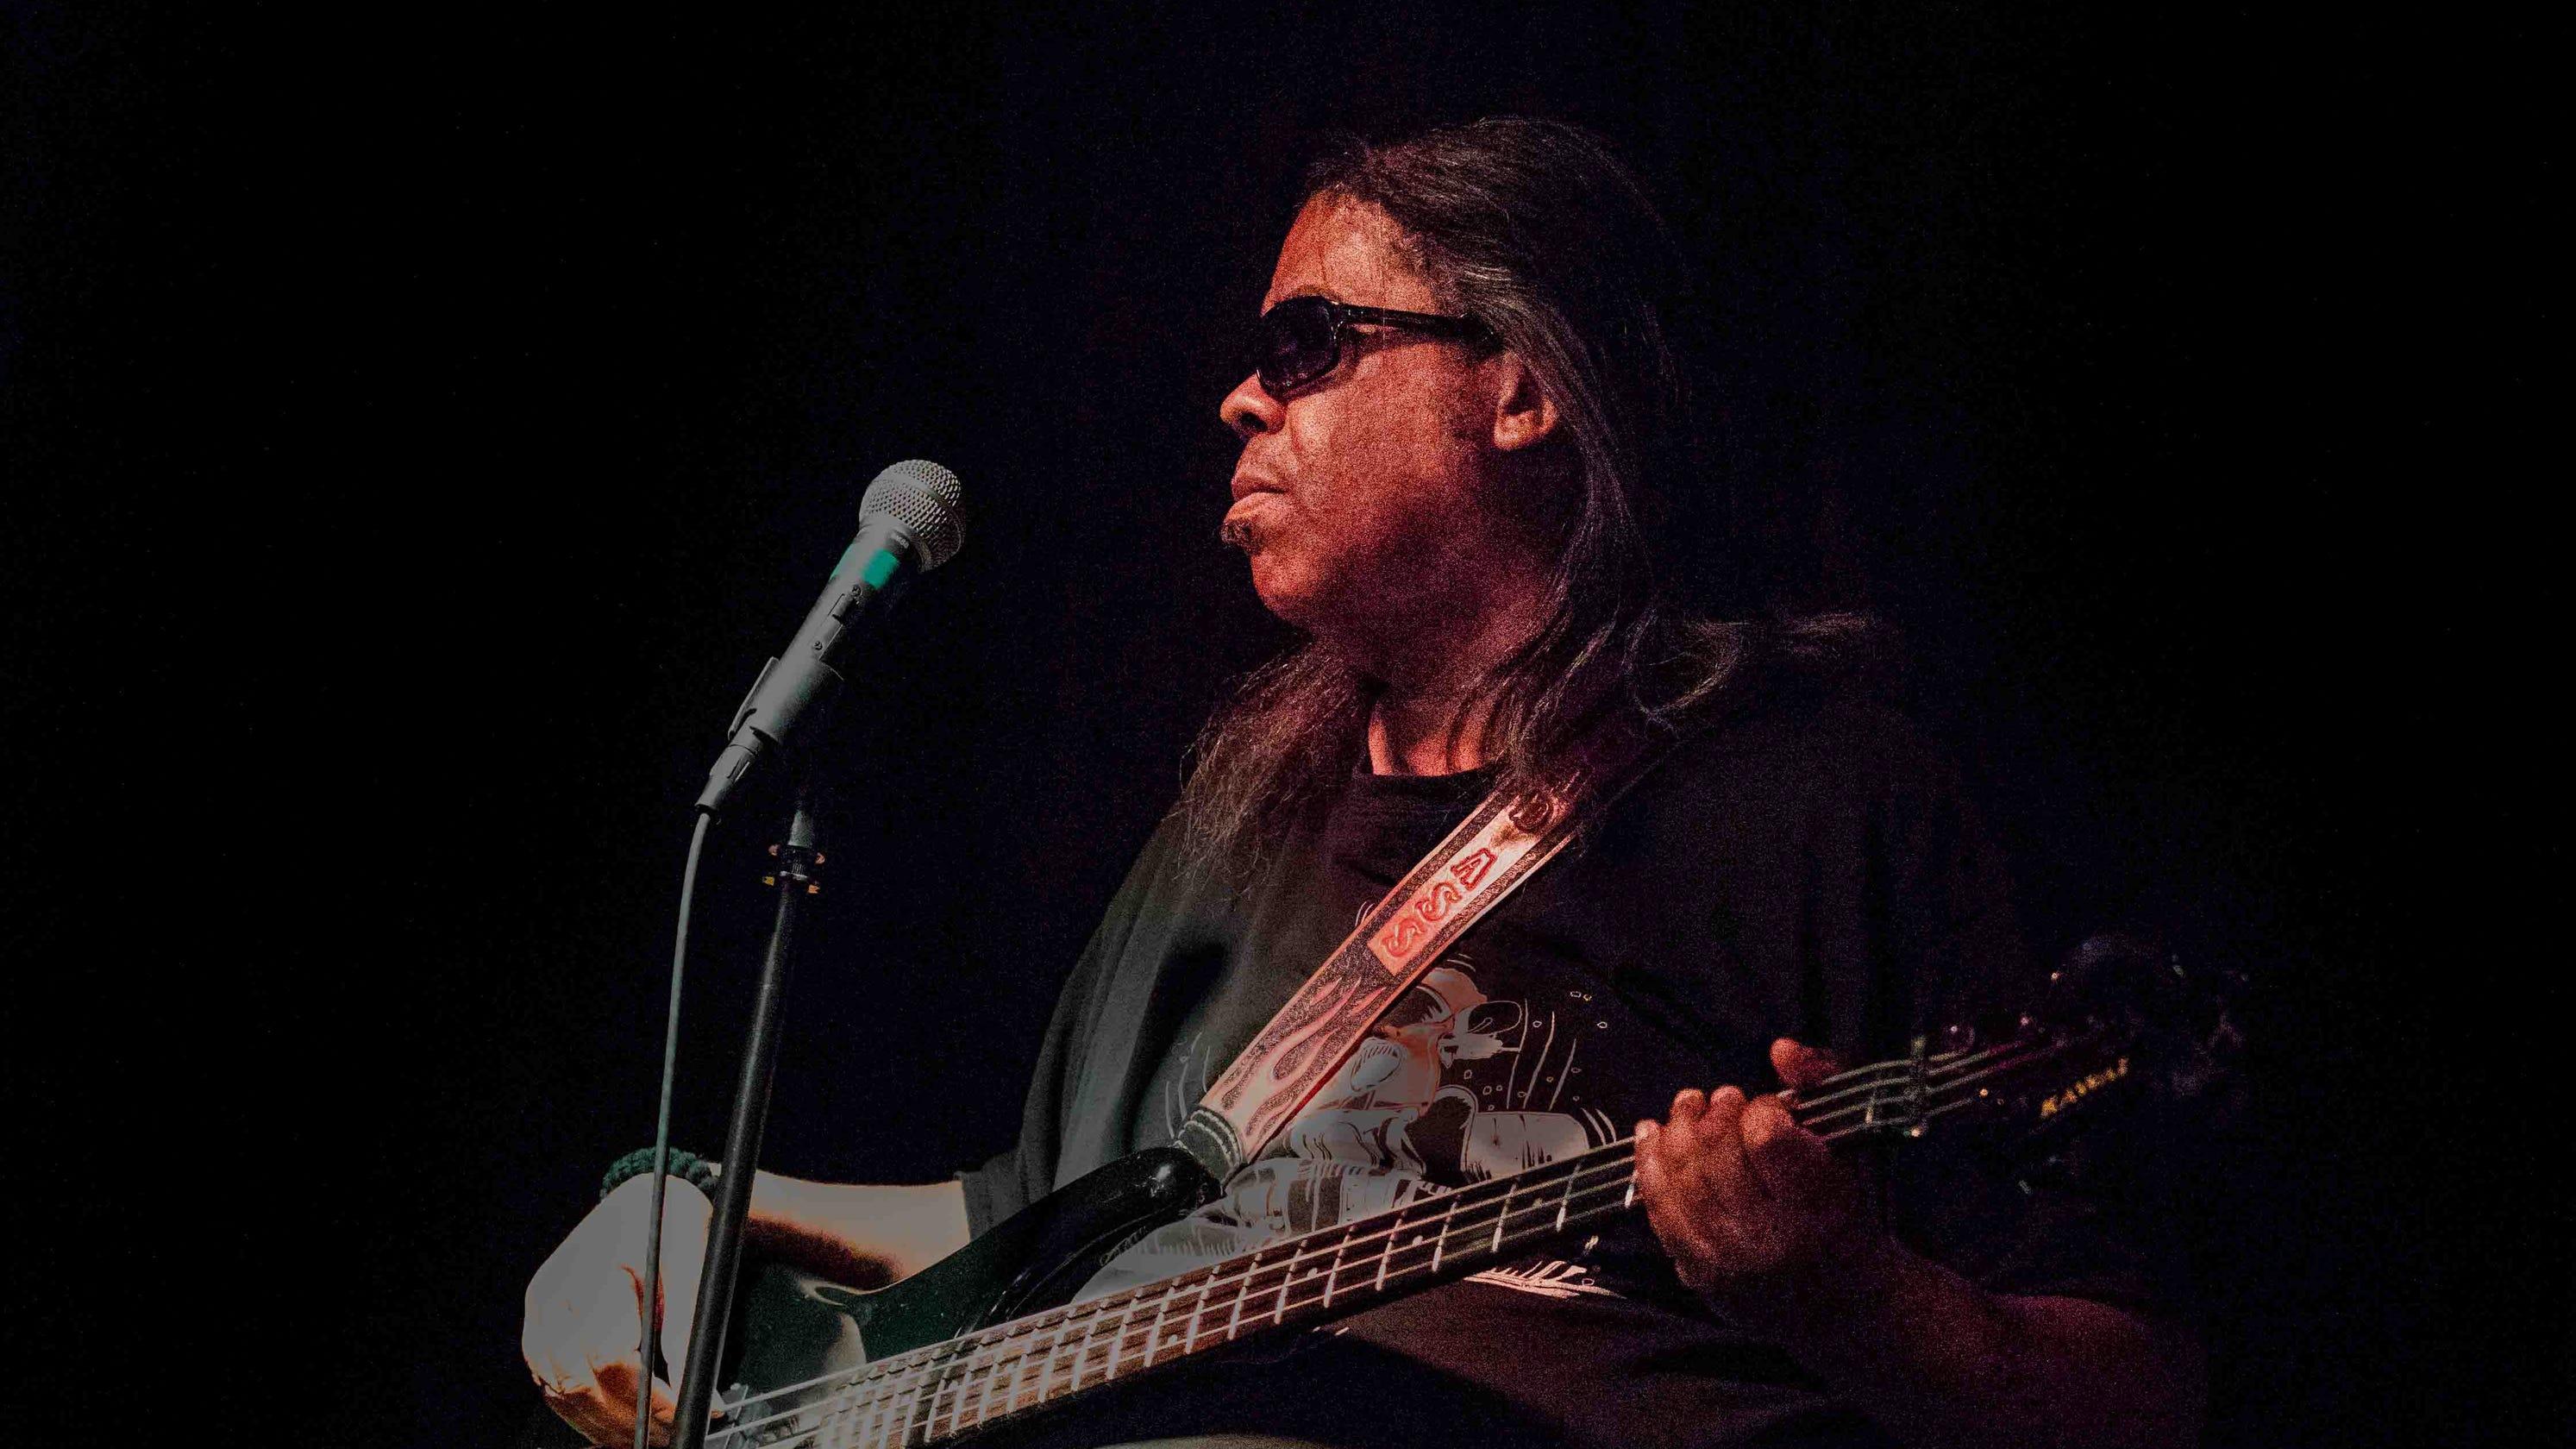 Detroit blues bass player and vocalist James Cloyd Jr. has died